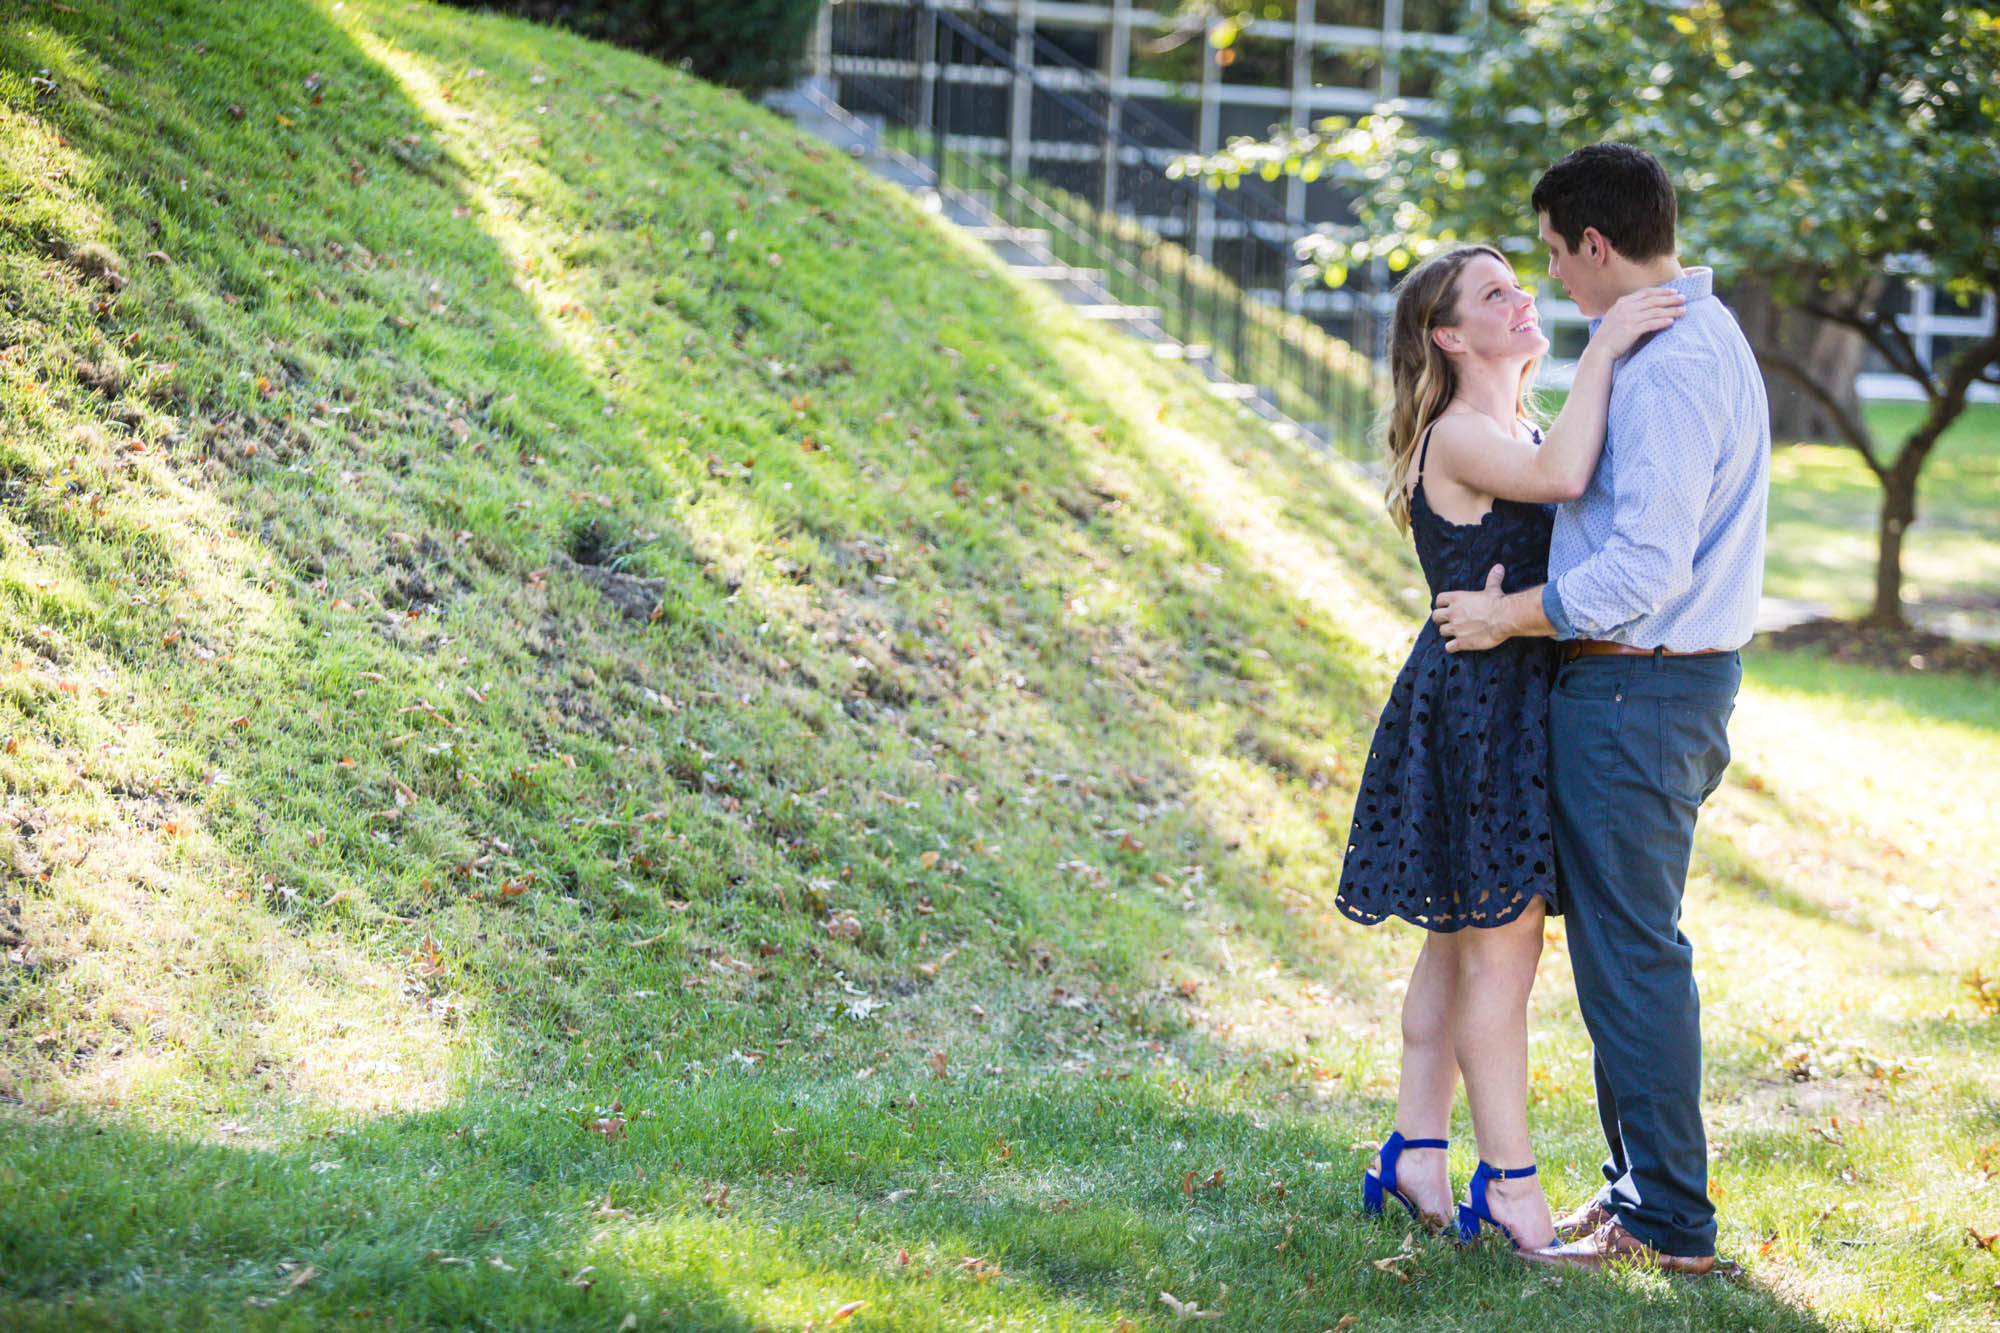 scranton_wedding_photographer_lettieri_pa (10 of 19).jpg